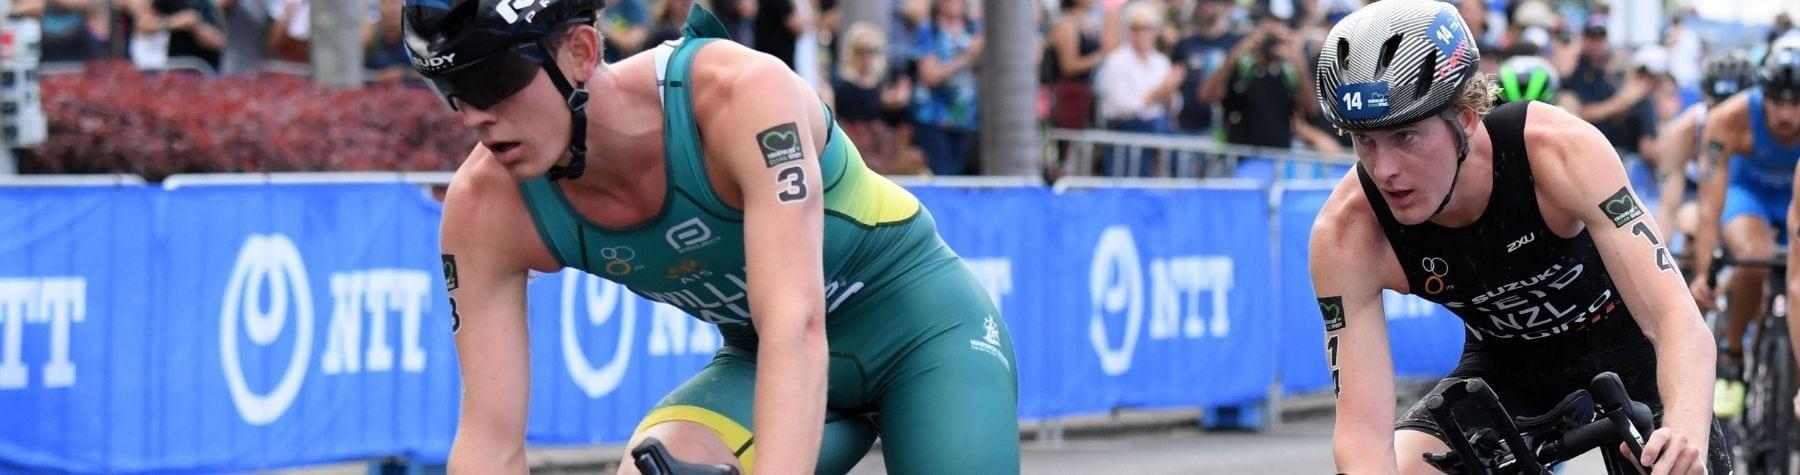 Oceania Triathlon Events Coming To Port Douglas